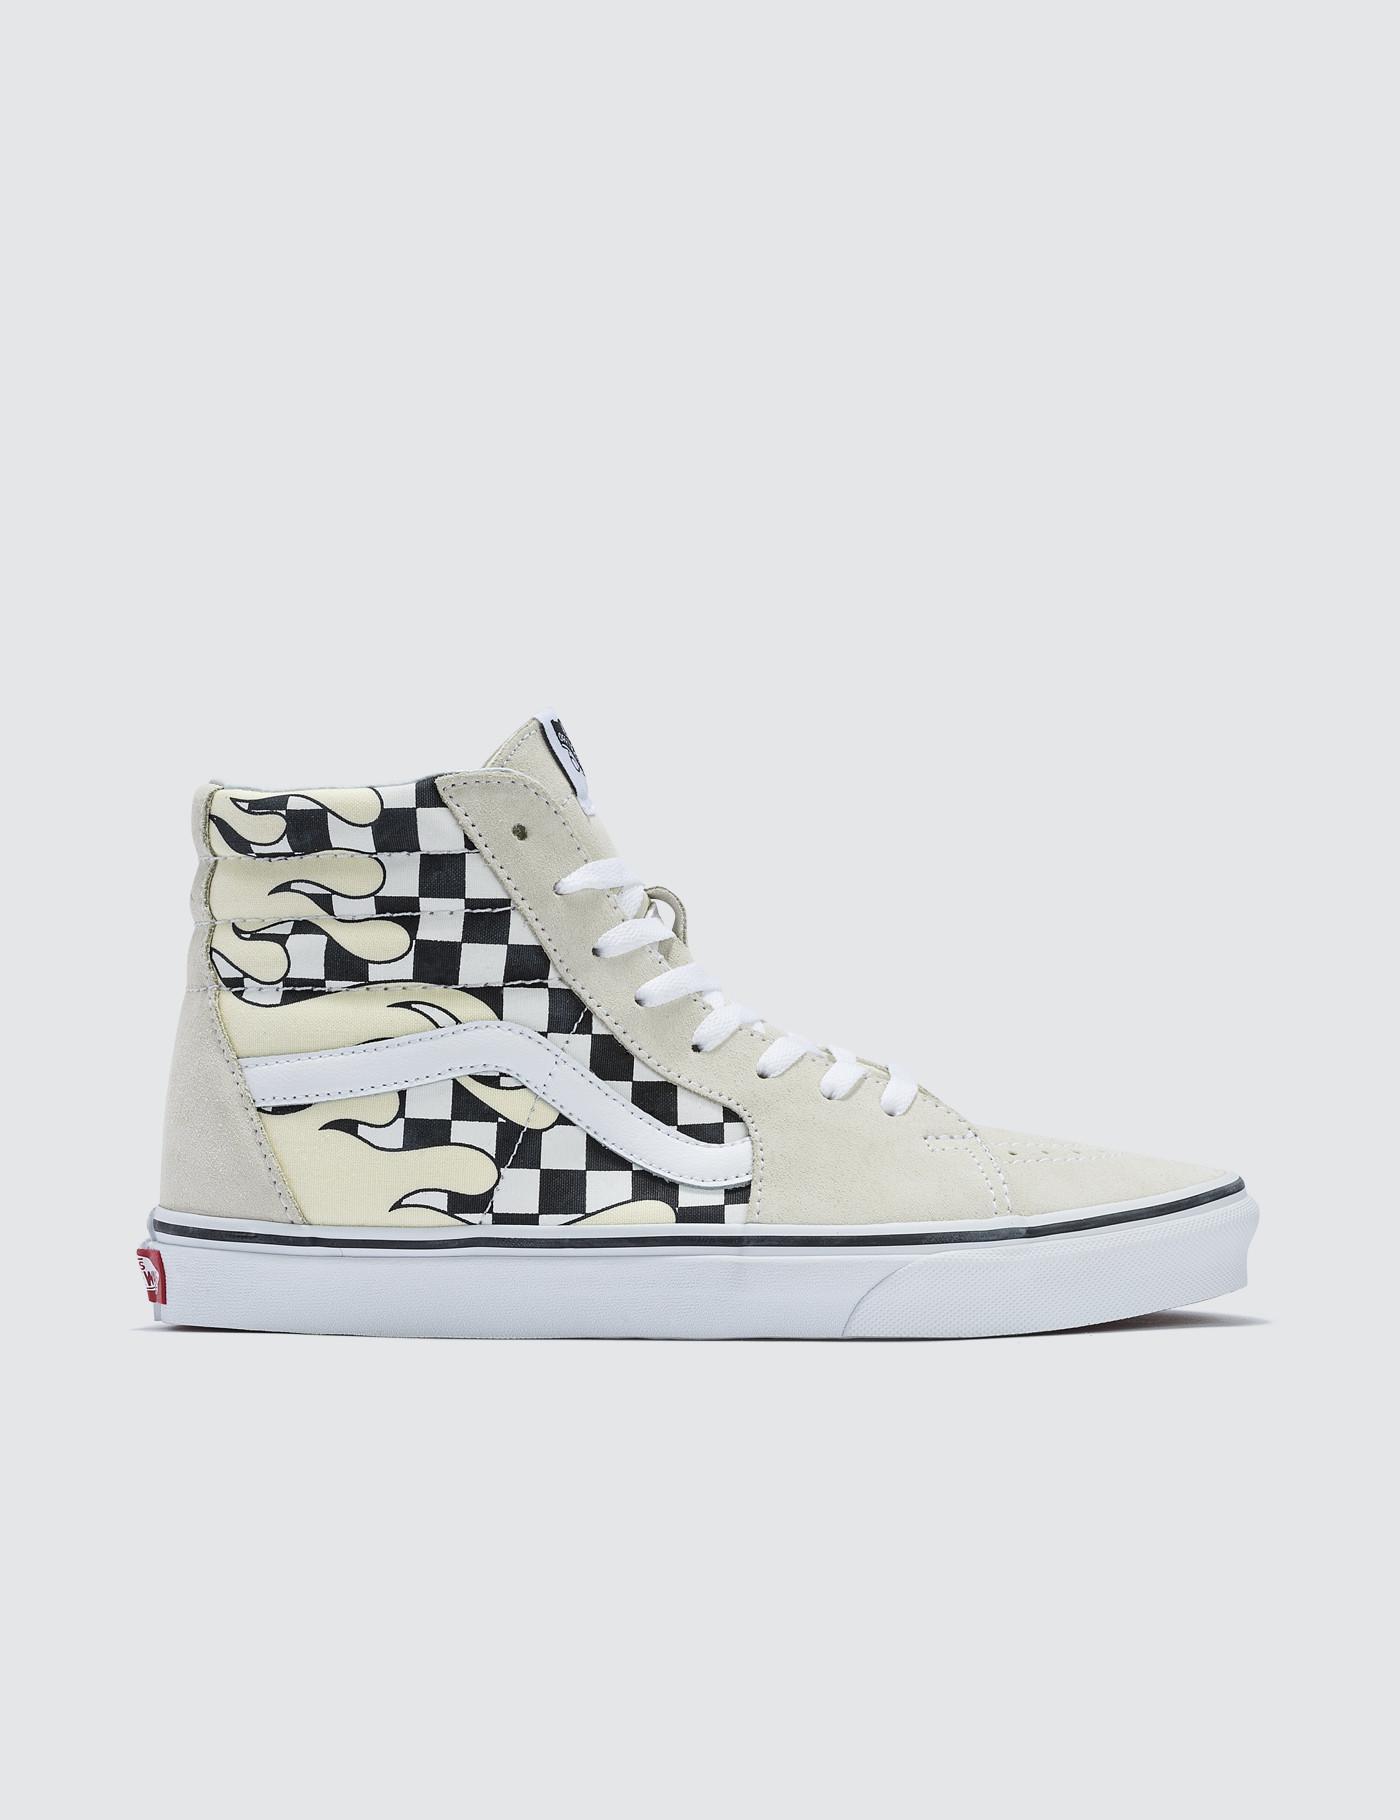 Vans Sk8-hi in White for Men - Lyst 2f51c6c0d